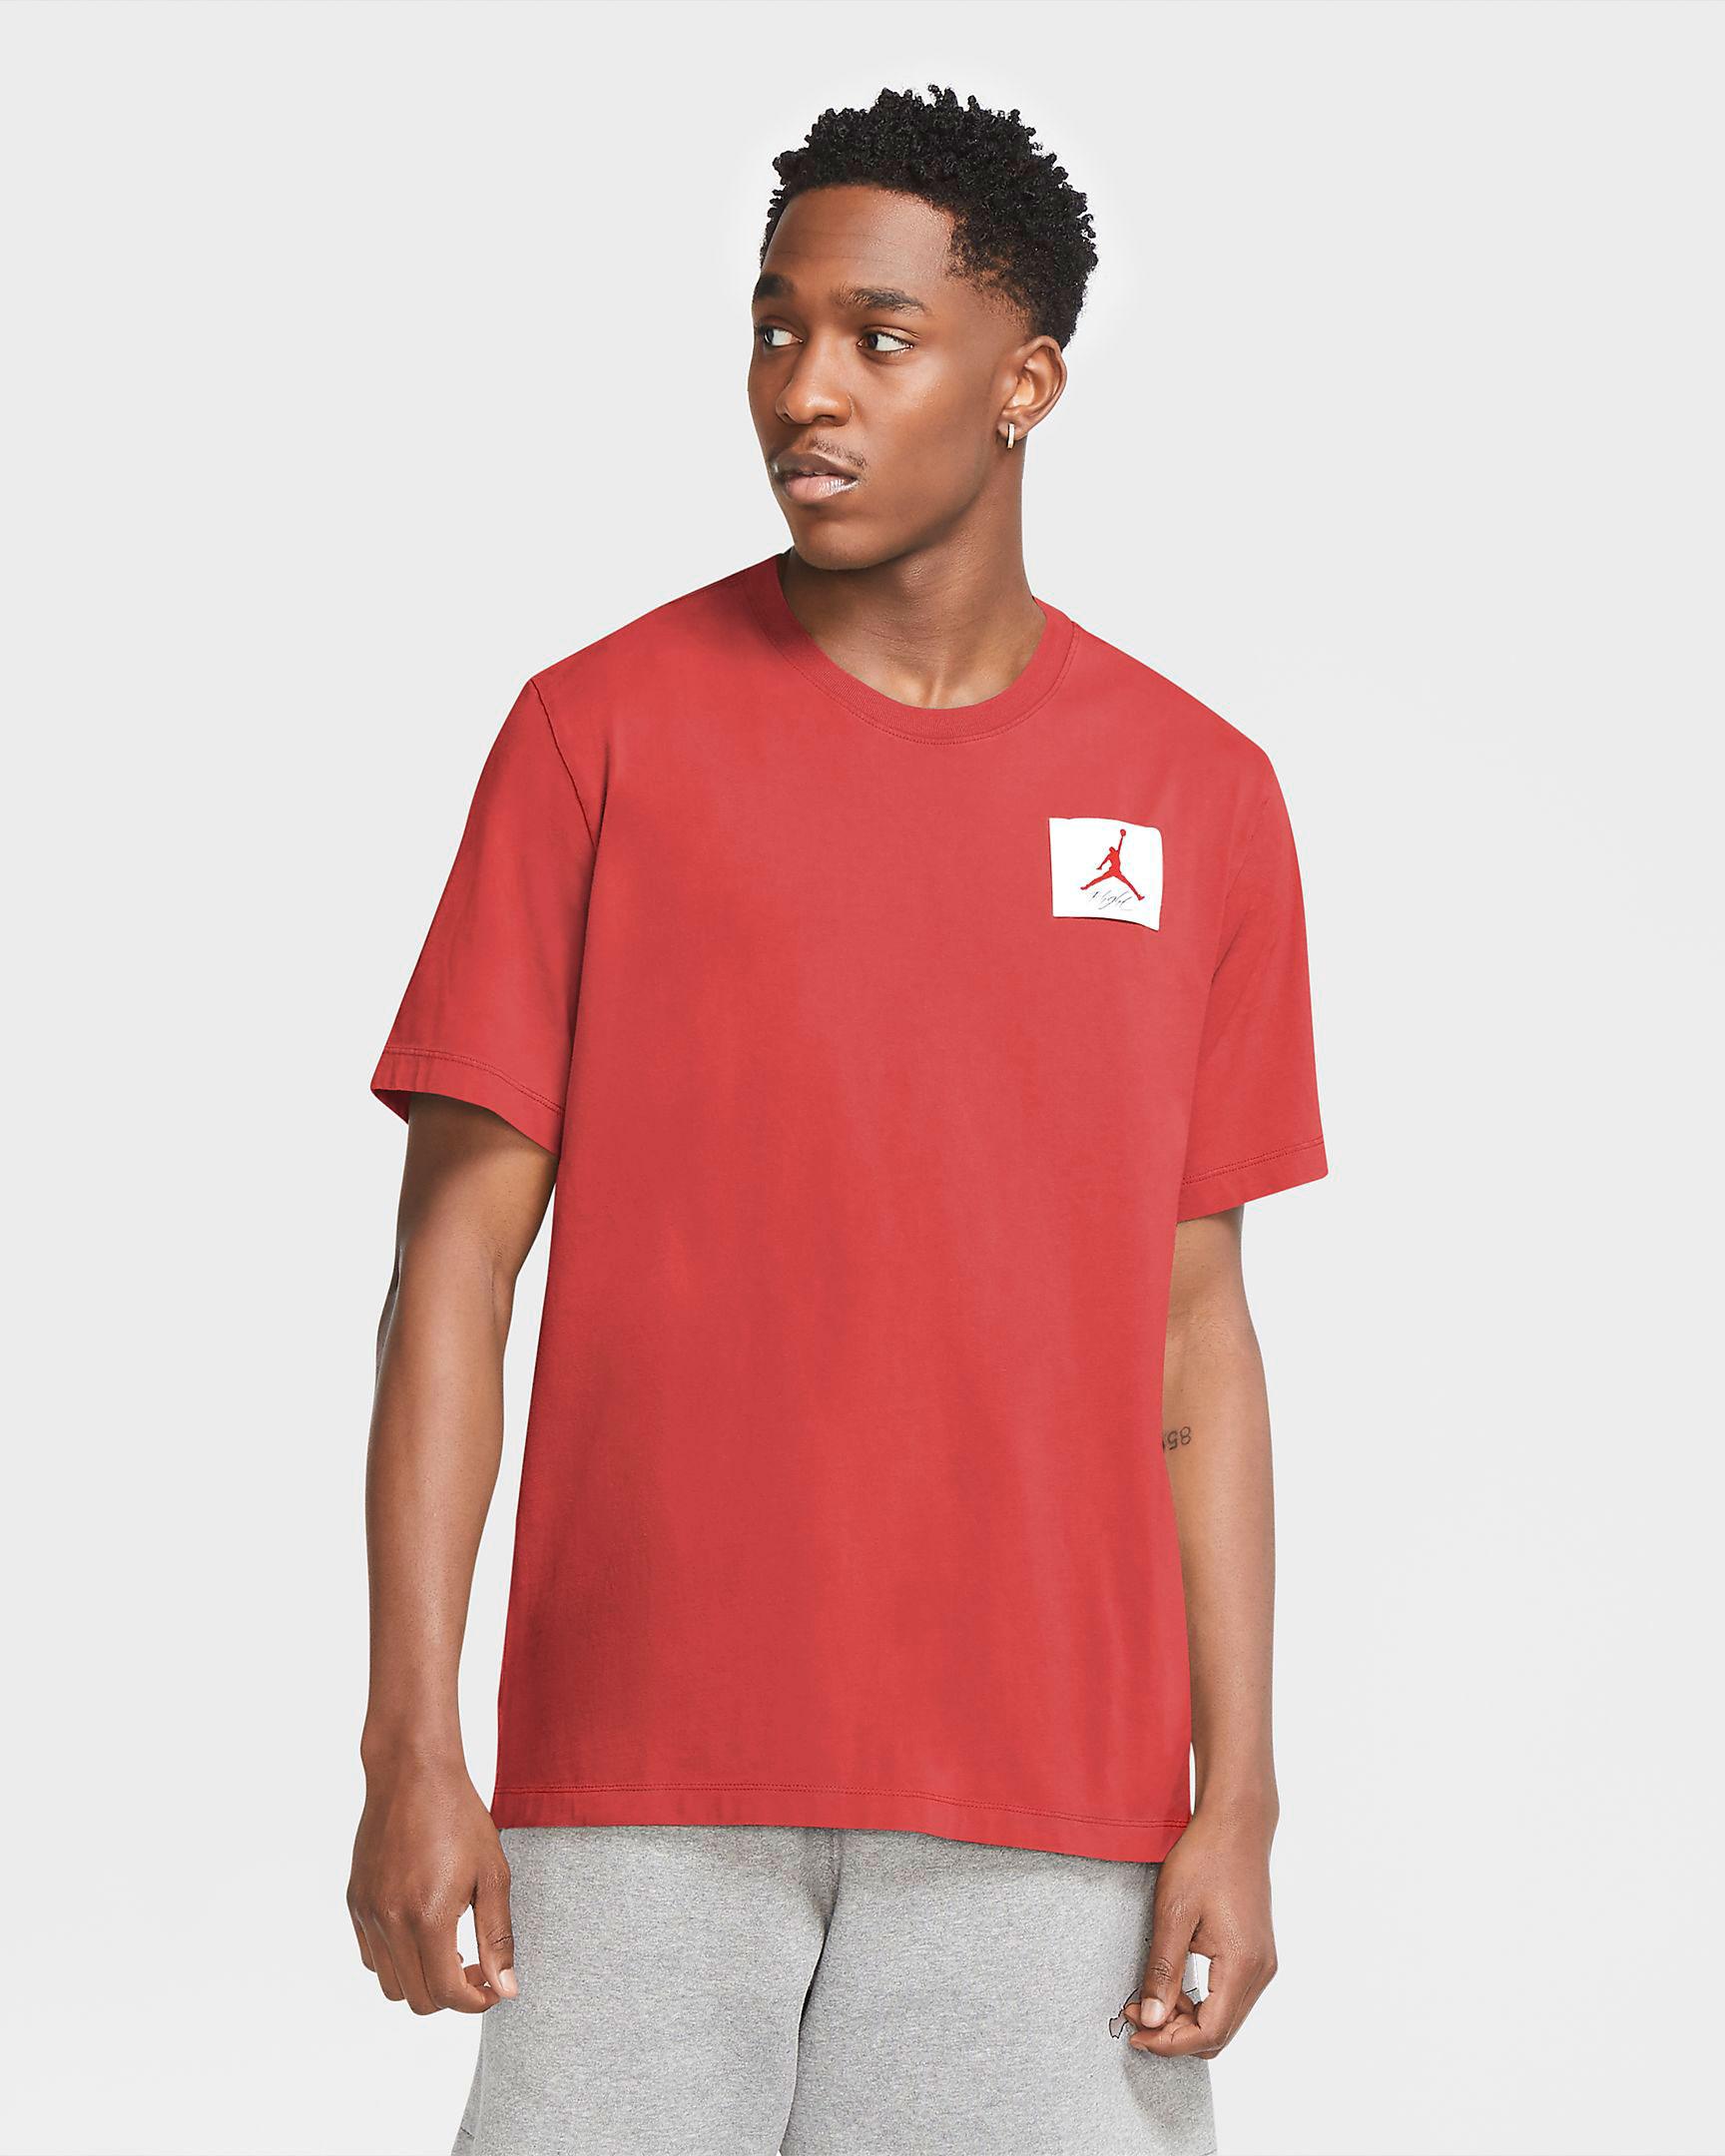 union-air-jordan-4-matching-shirt